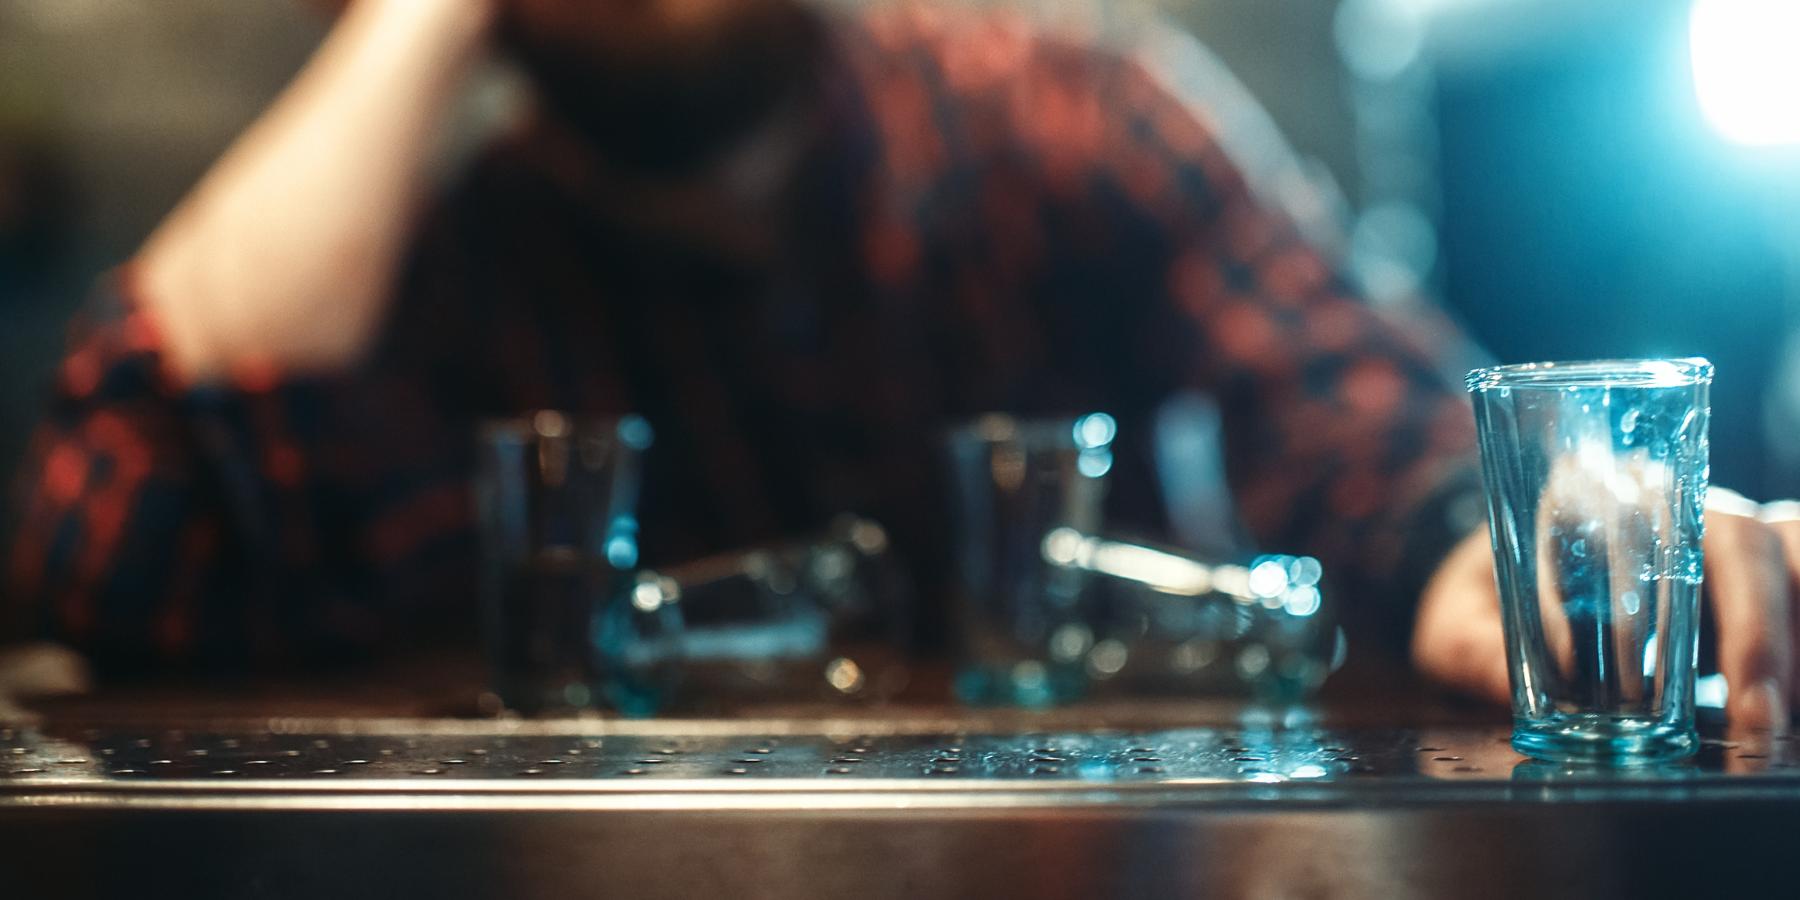 Man sitting at bar